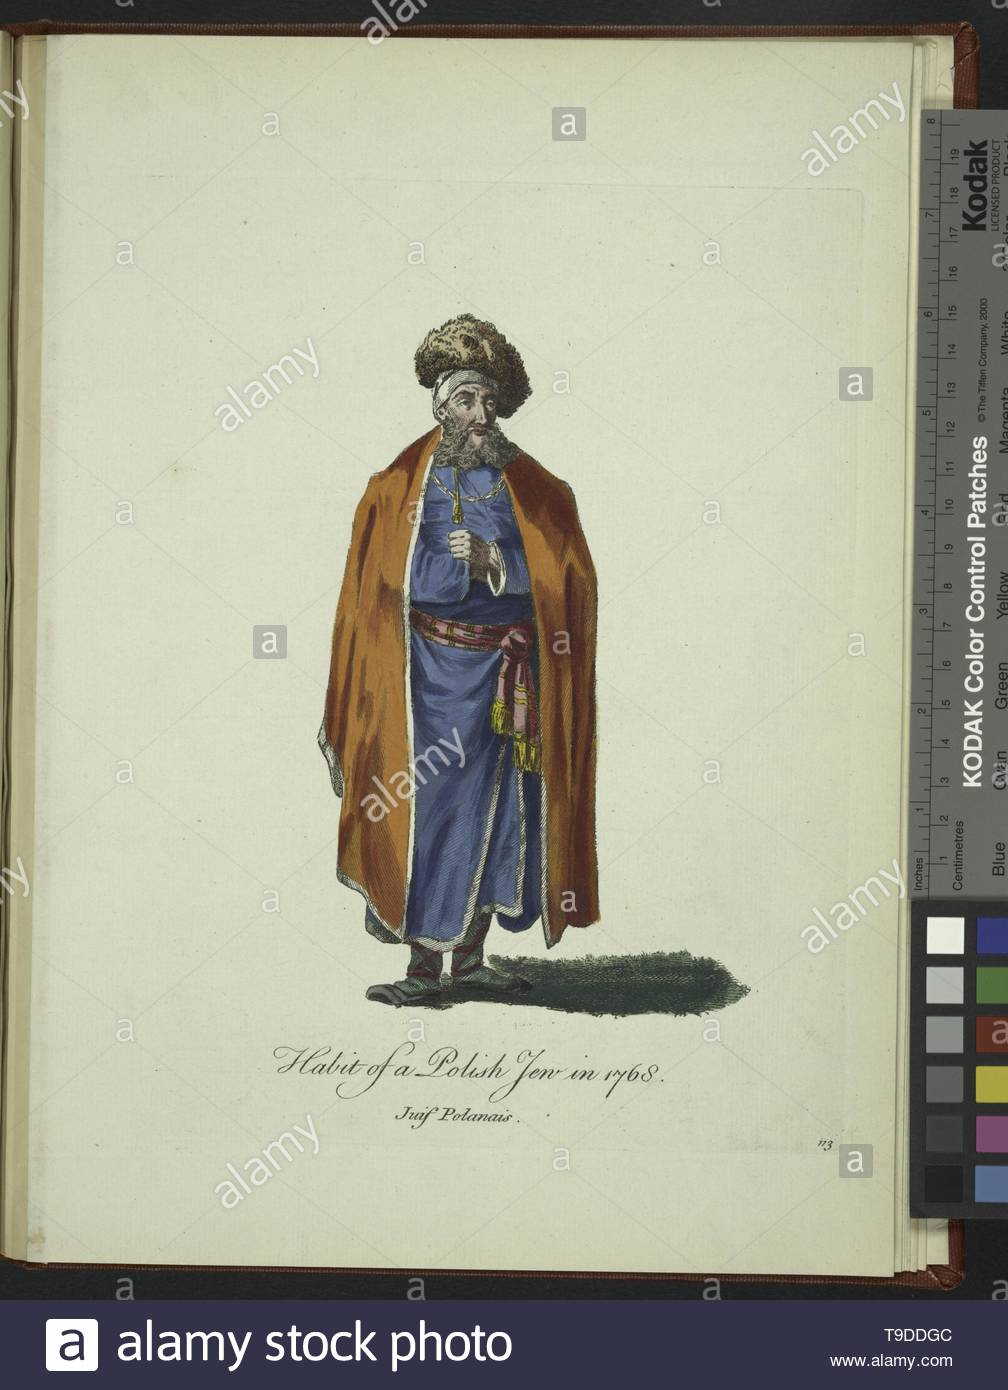 LePrince,Jean-Baptiste(1734-1781)-Habit of a Polish Jew in 1768  Juif Polanais - Stock Image